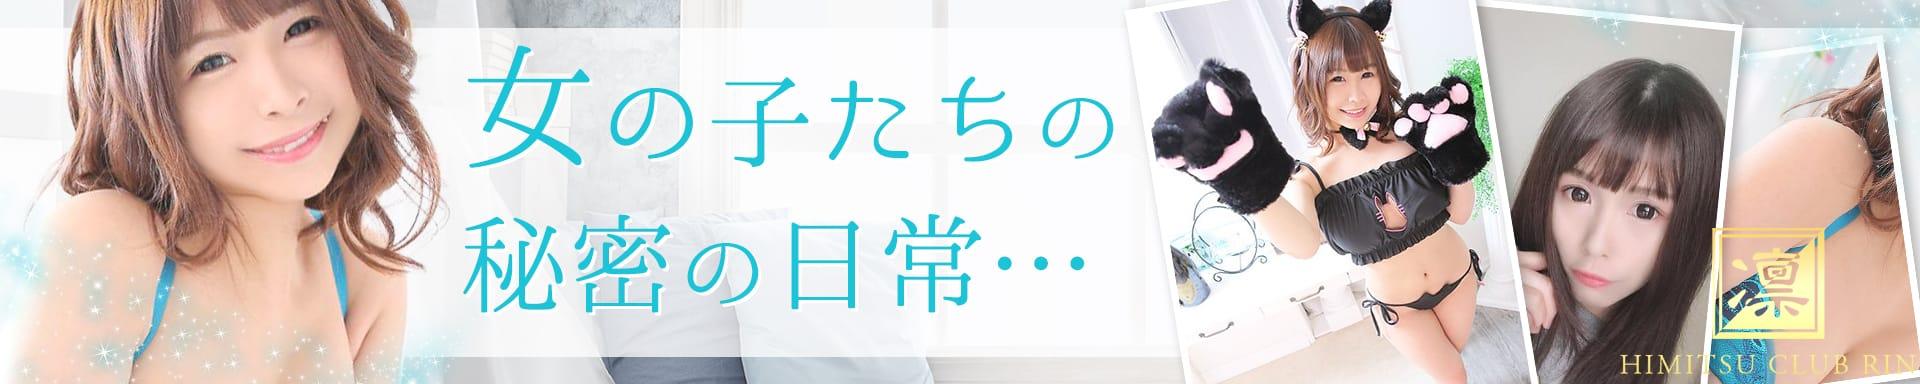 HIMITSU CLUB RIN FUNABASHI その2